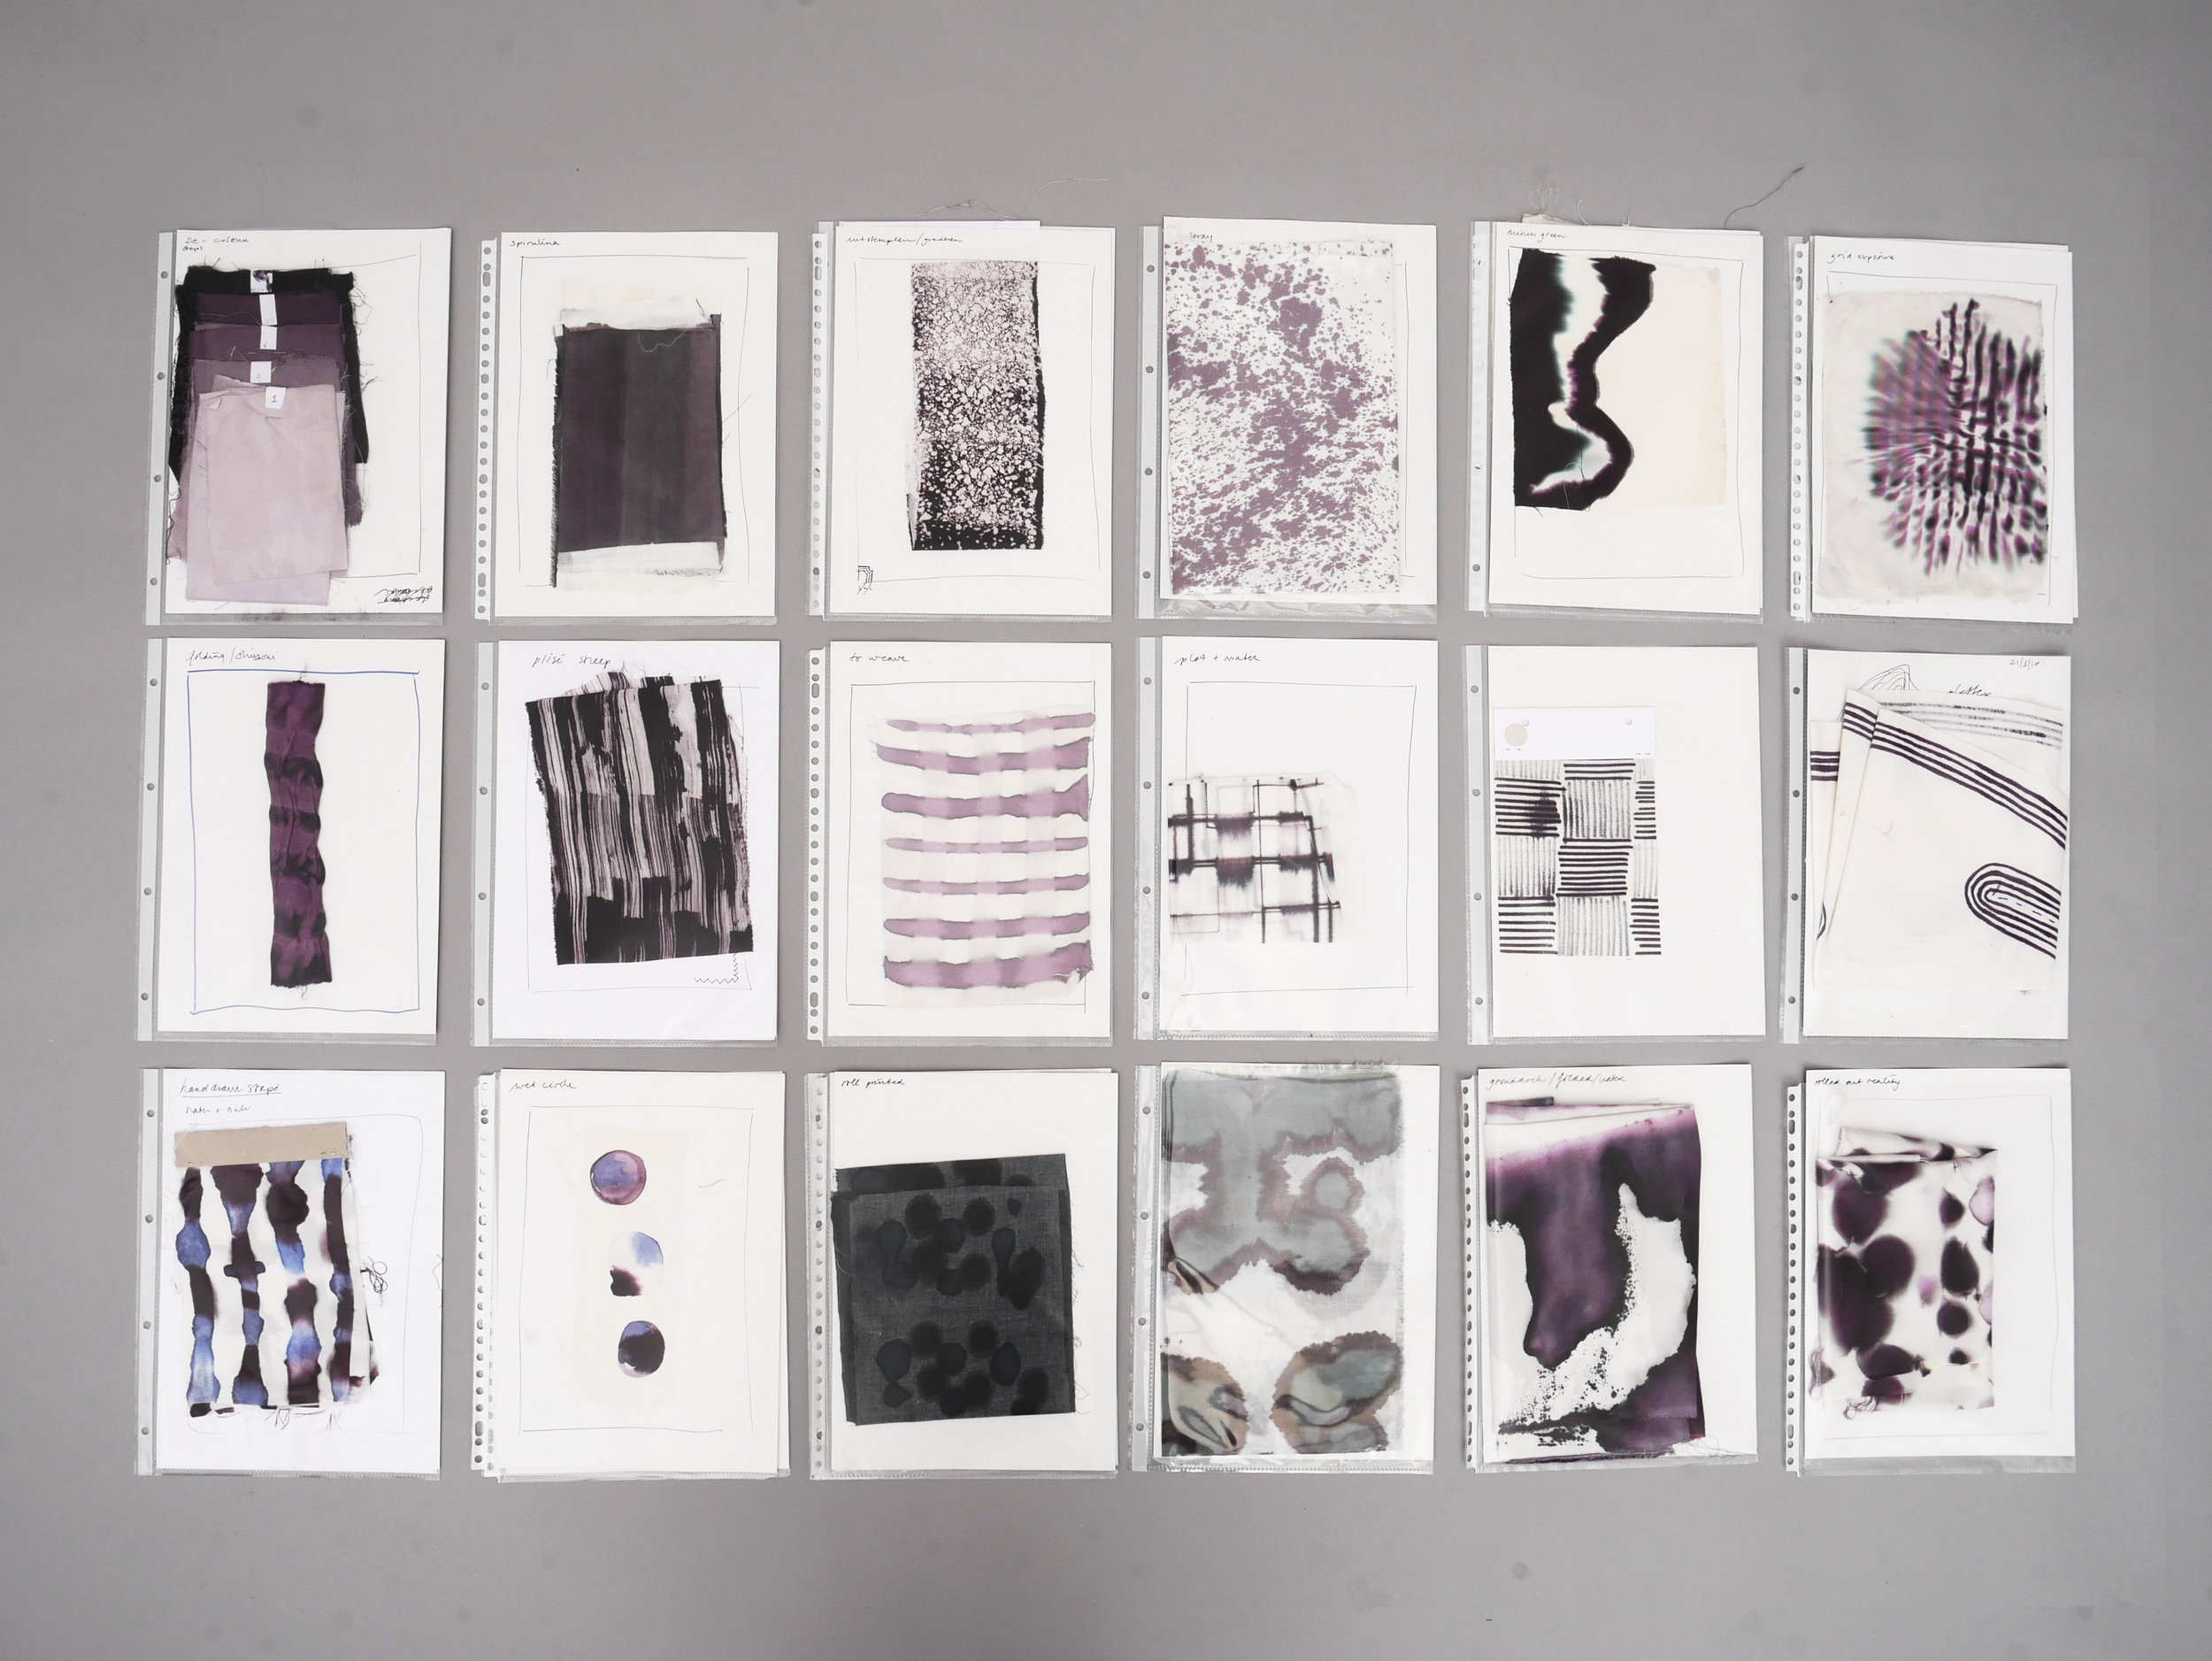 Aliki's research on upcycling waste inks. Courtesy of Aliki van der Kruijs